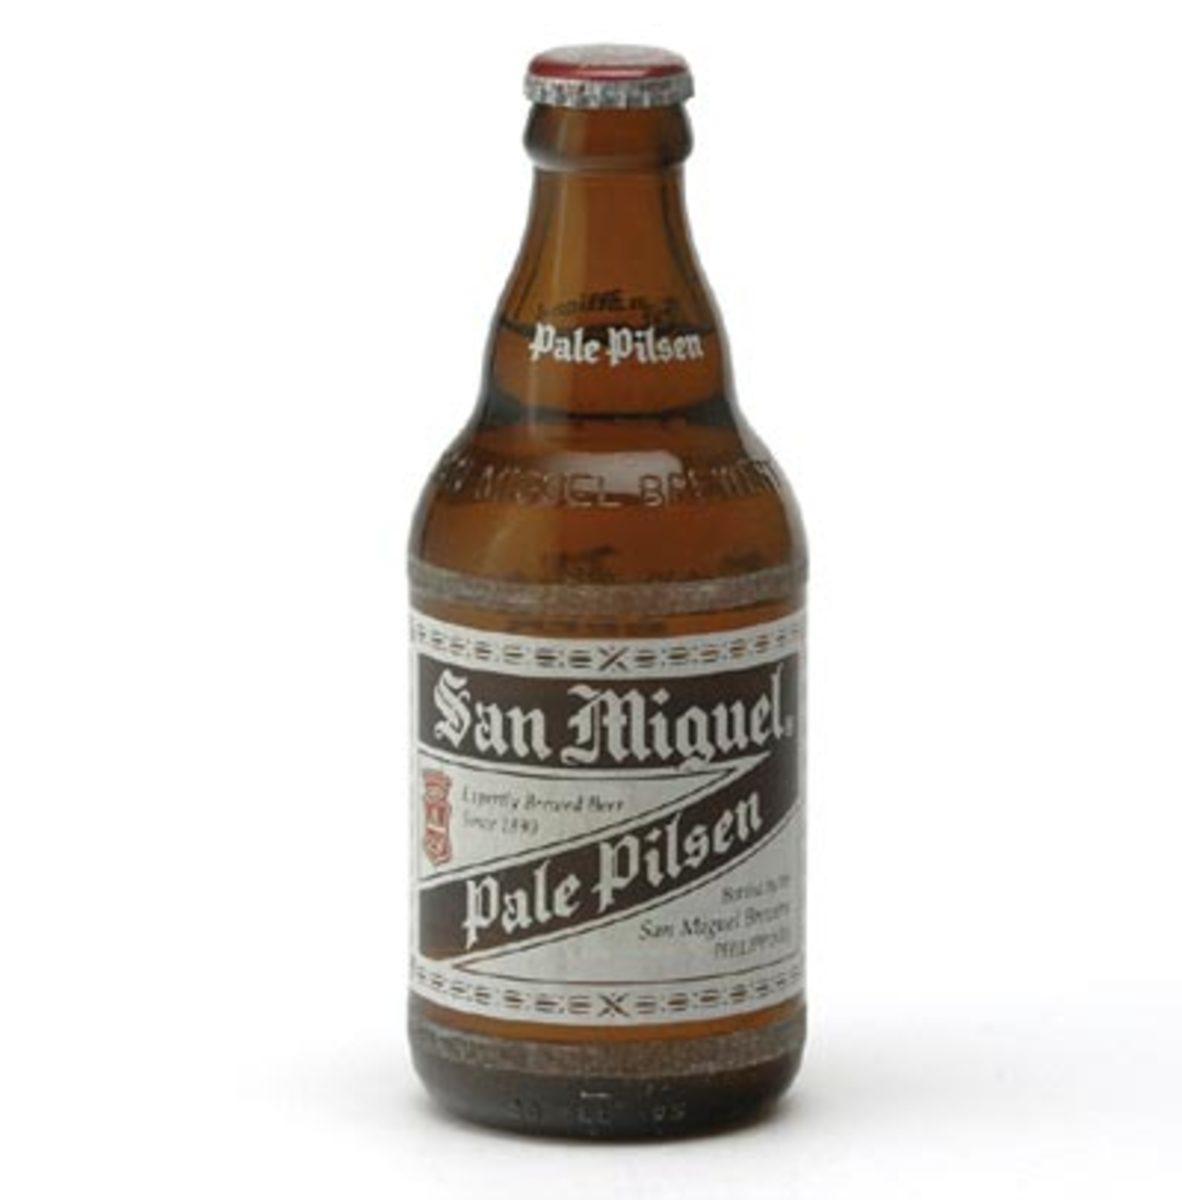 San Miguel Beer, Filipino beer